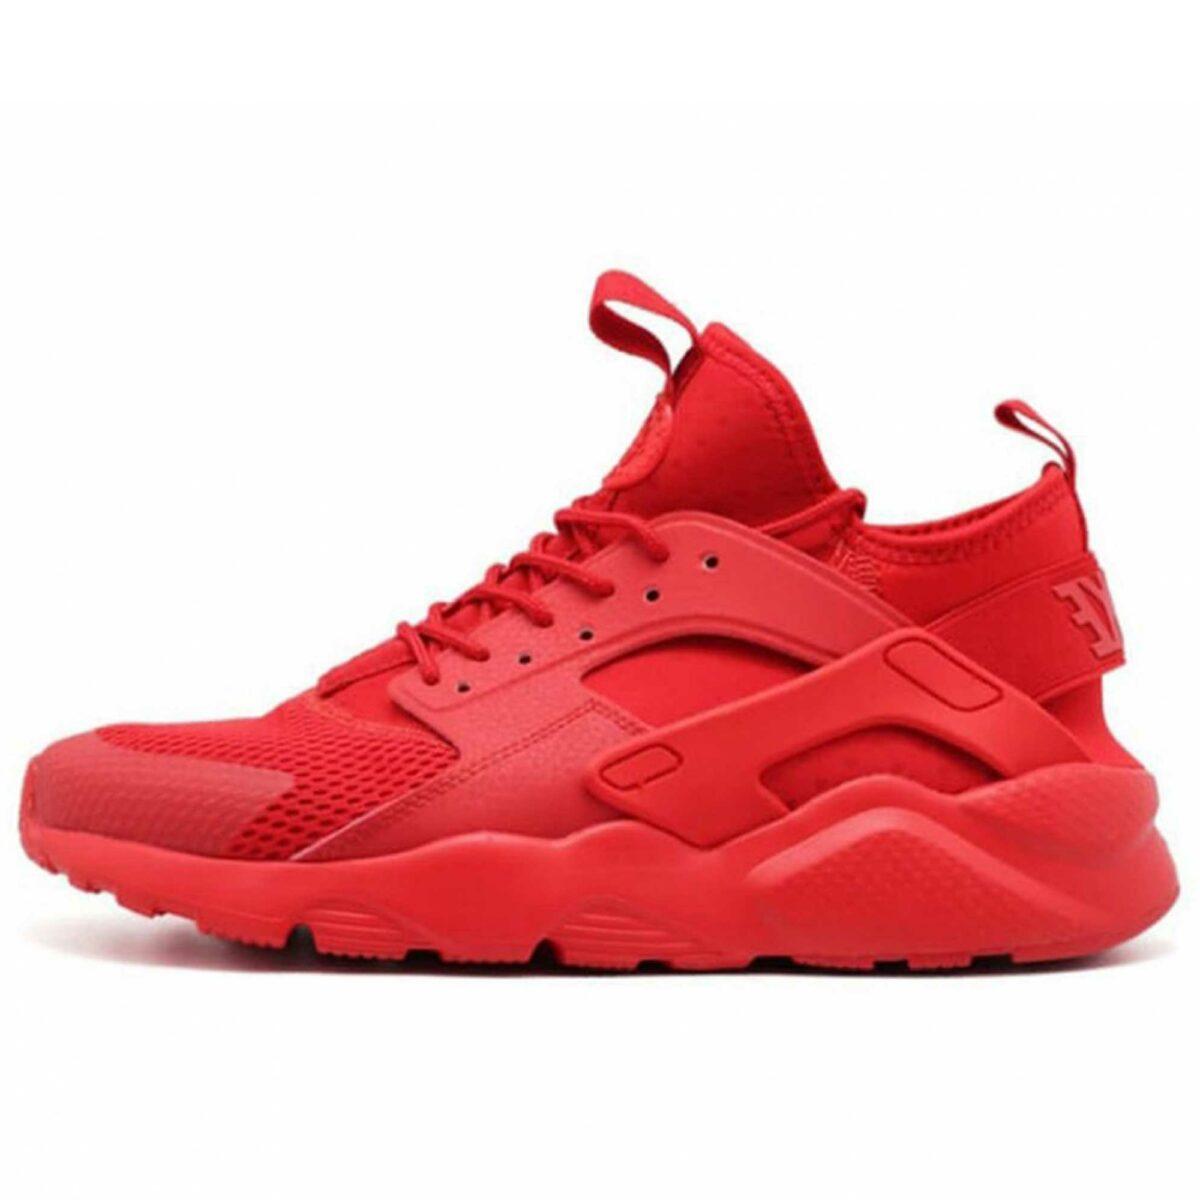 nike air huarache run ultra red купить